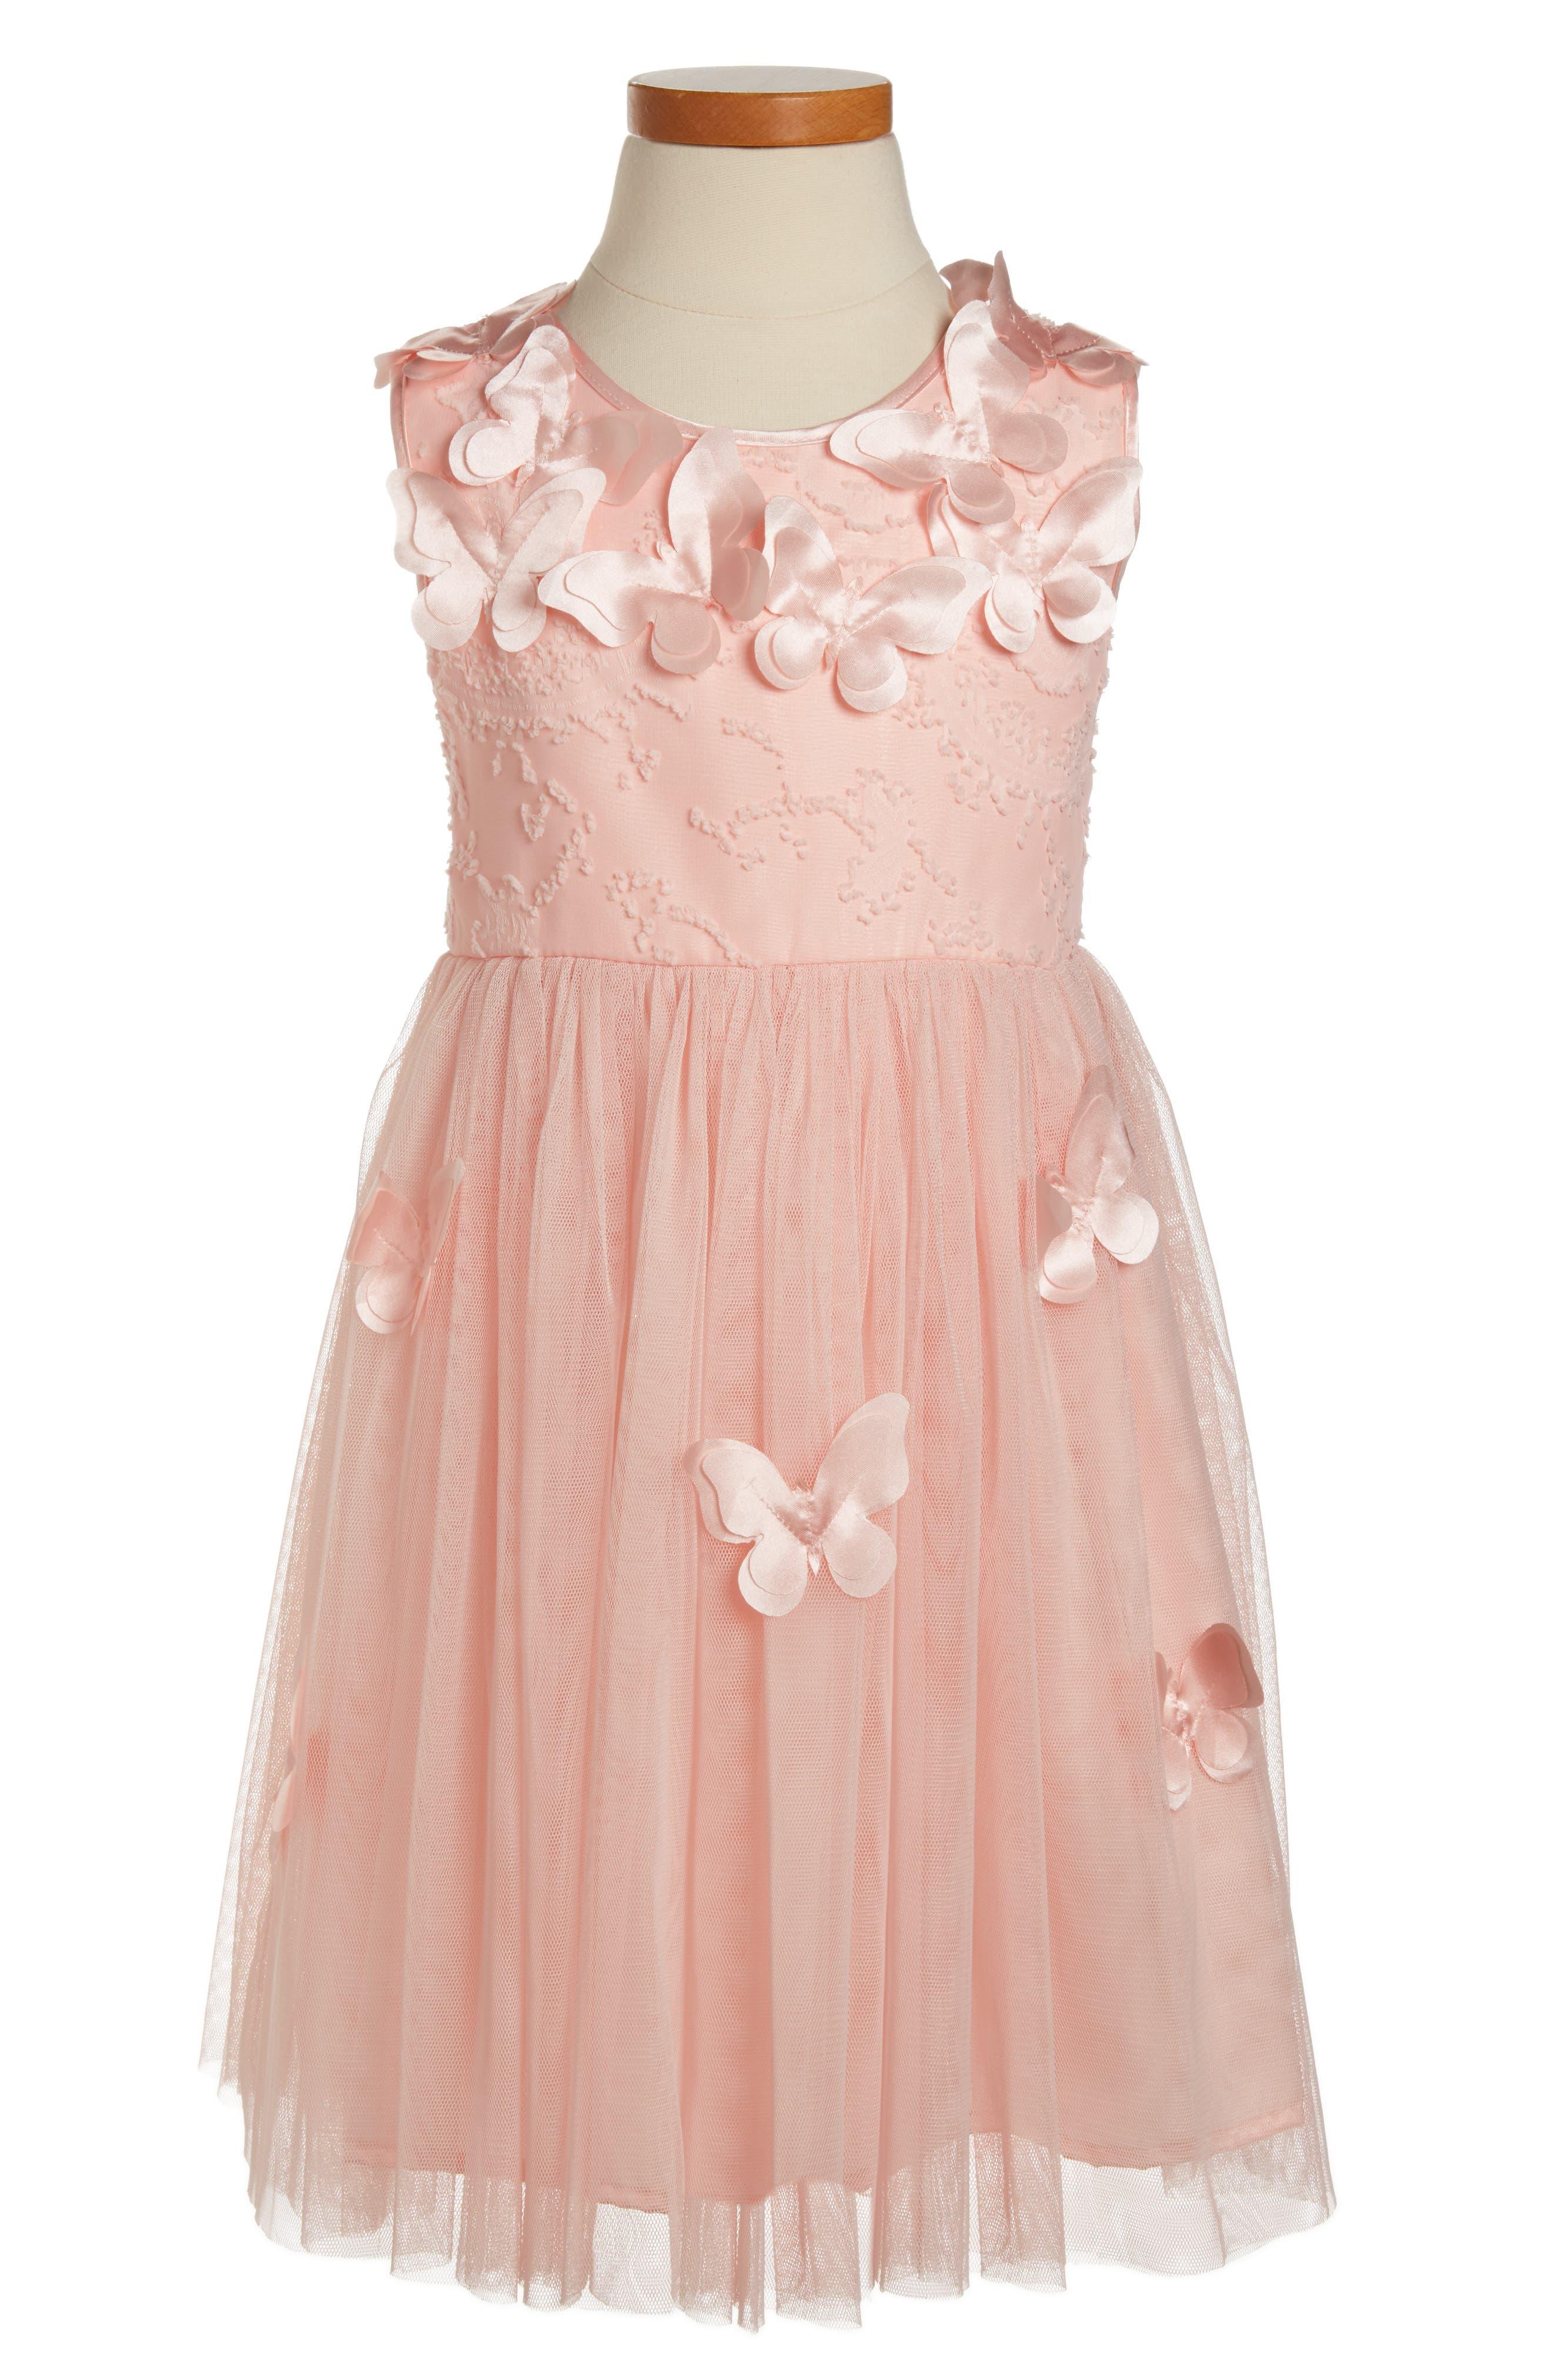 Image of Popatu Peach Butterfly Dress